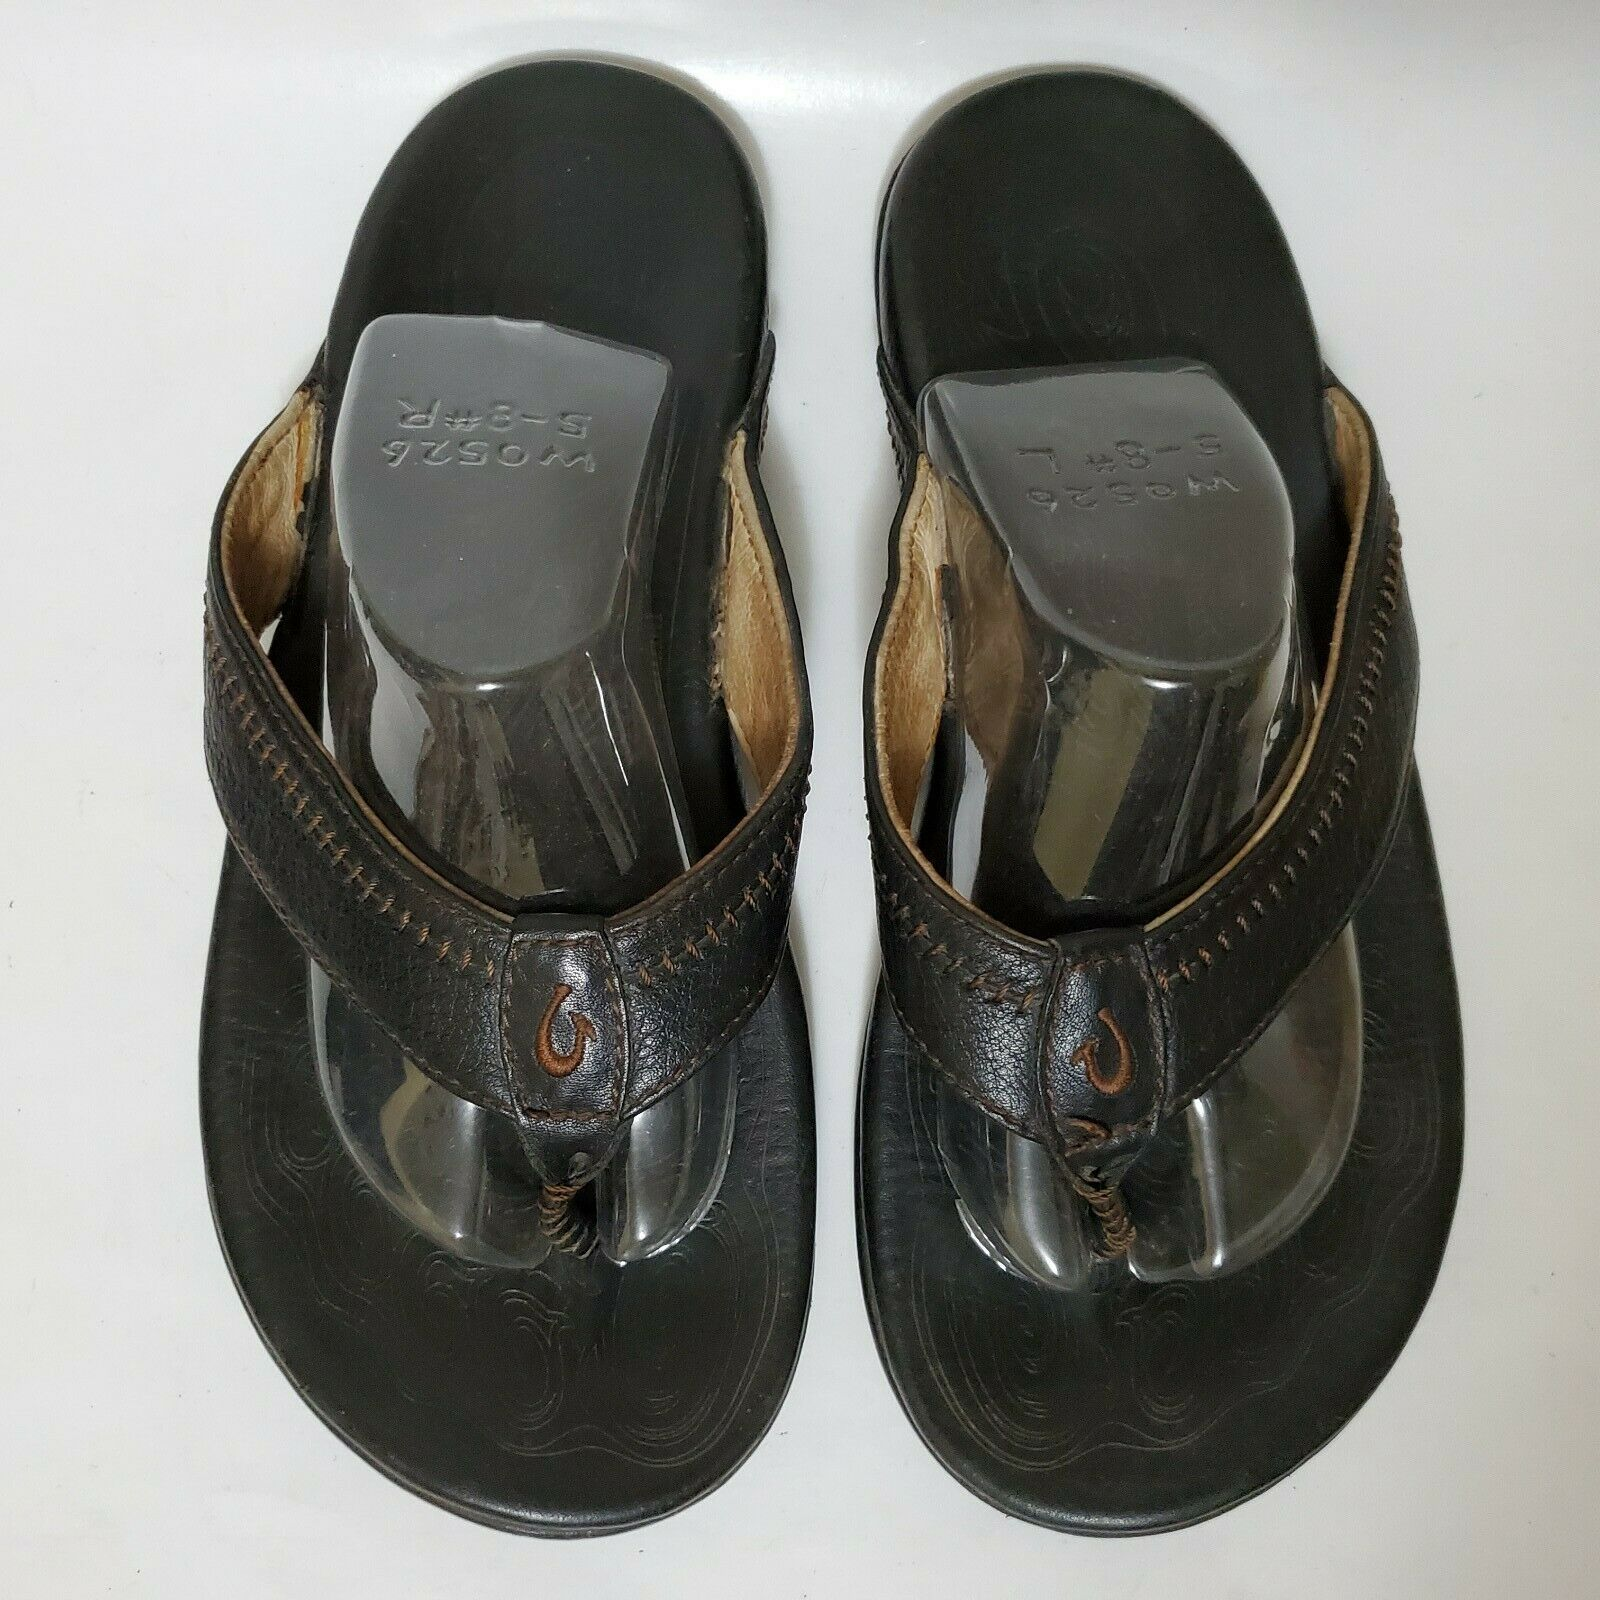 Olukai Hiapo 9 Mens 10101-4040 Black Leather Slippers Flip Flops Shoes